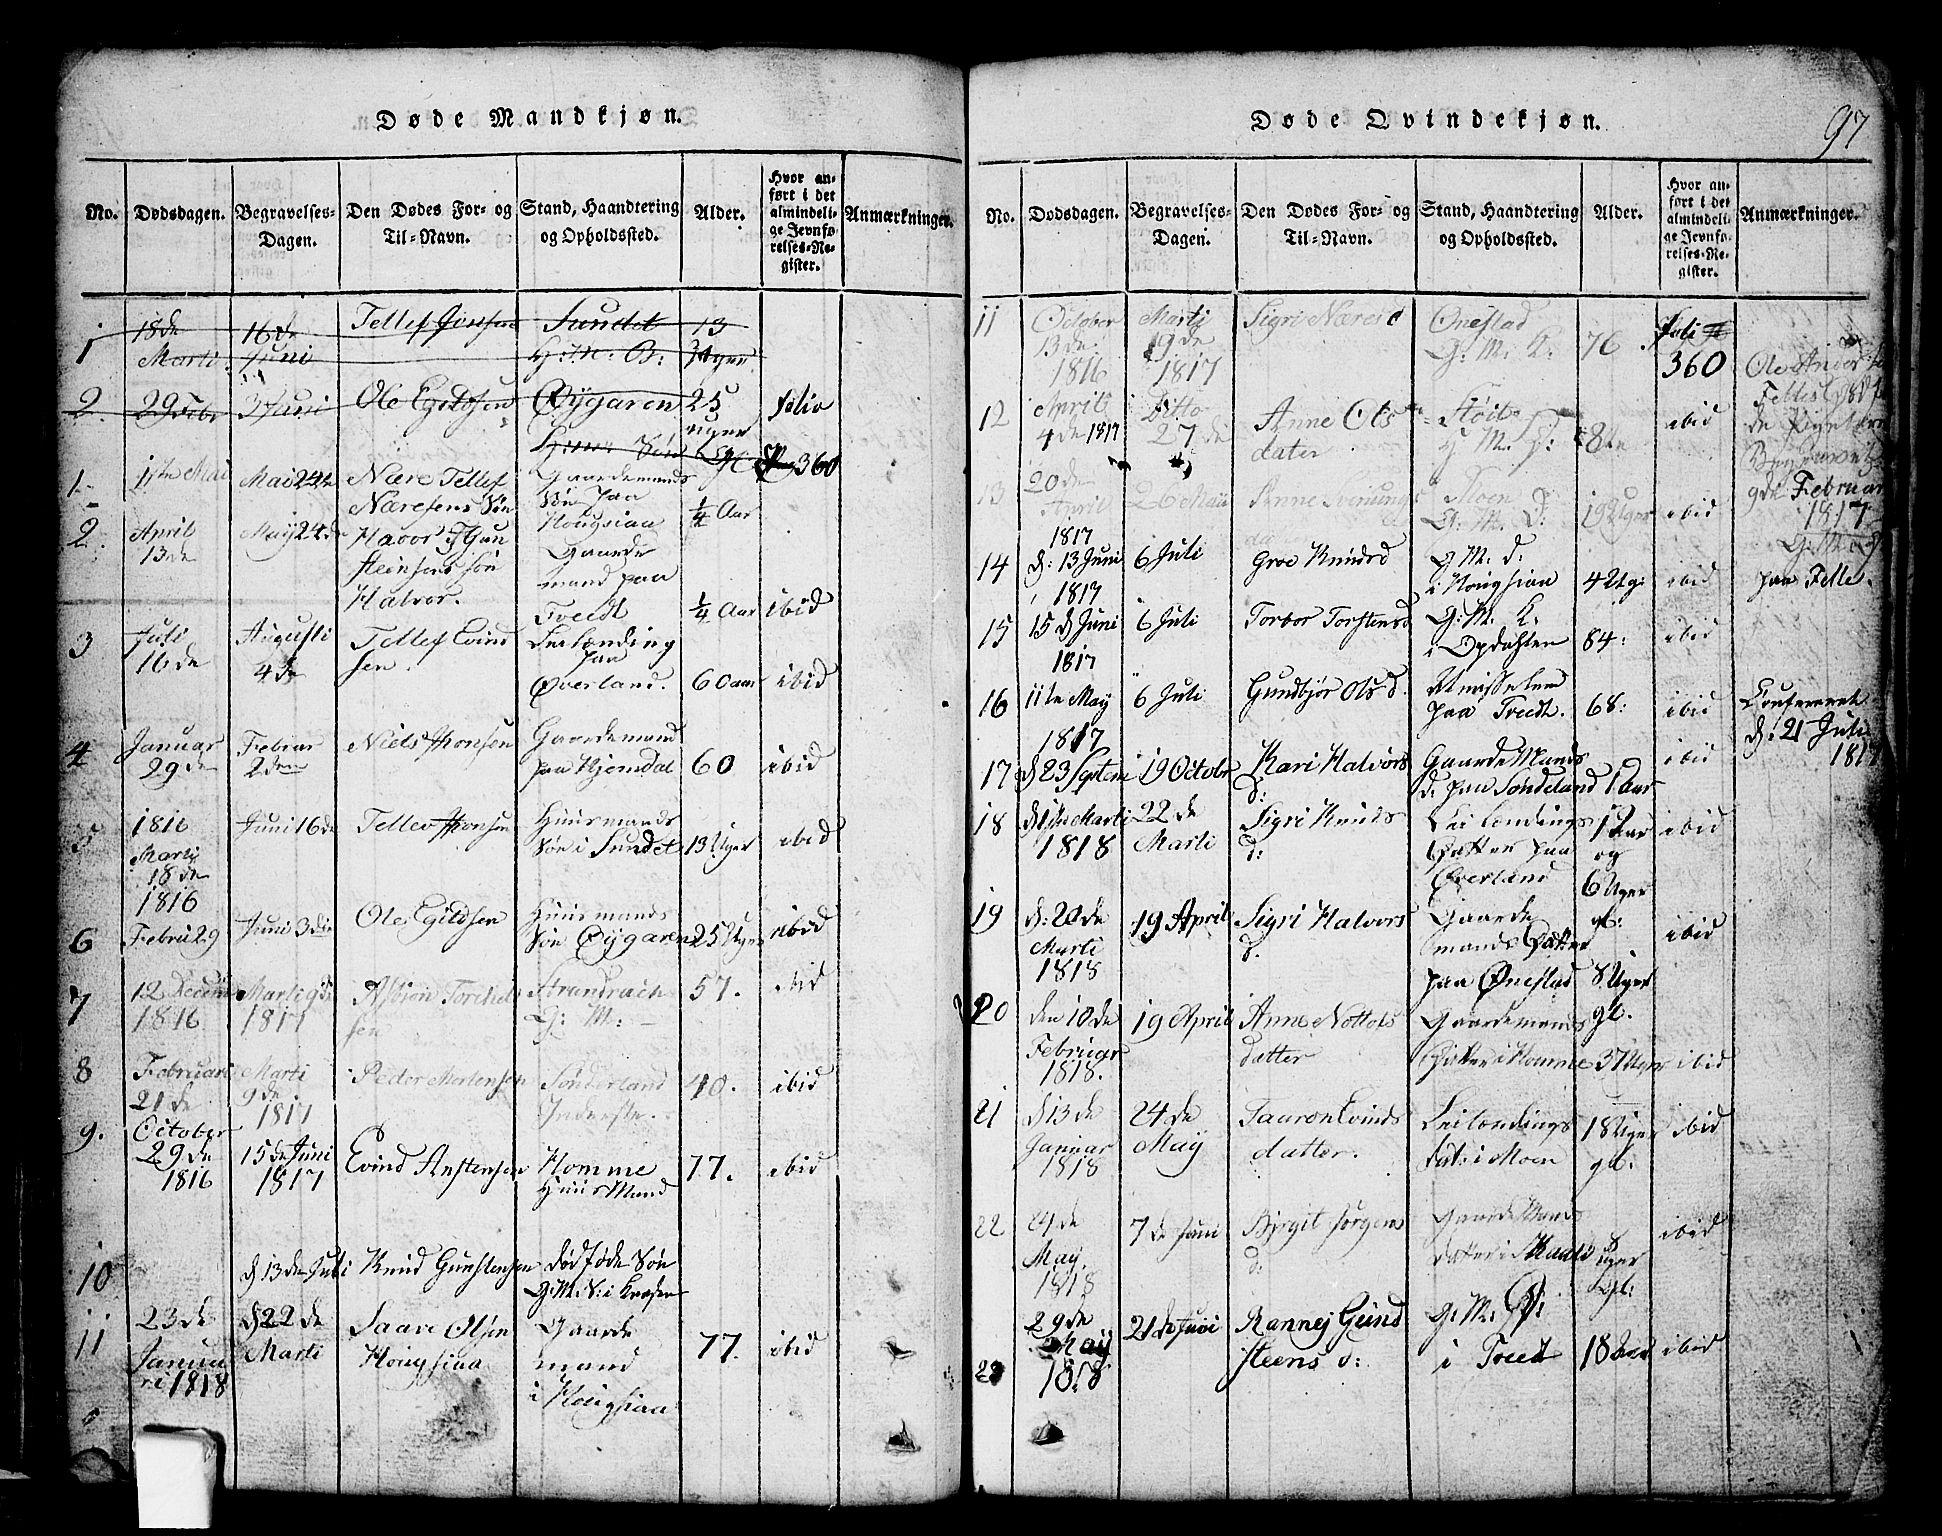 SAKO, Nissedal kirkebøker, G/Gb/L0001: Klokkerbok nr. II 1, 1814-1862, s. 97